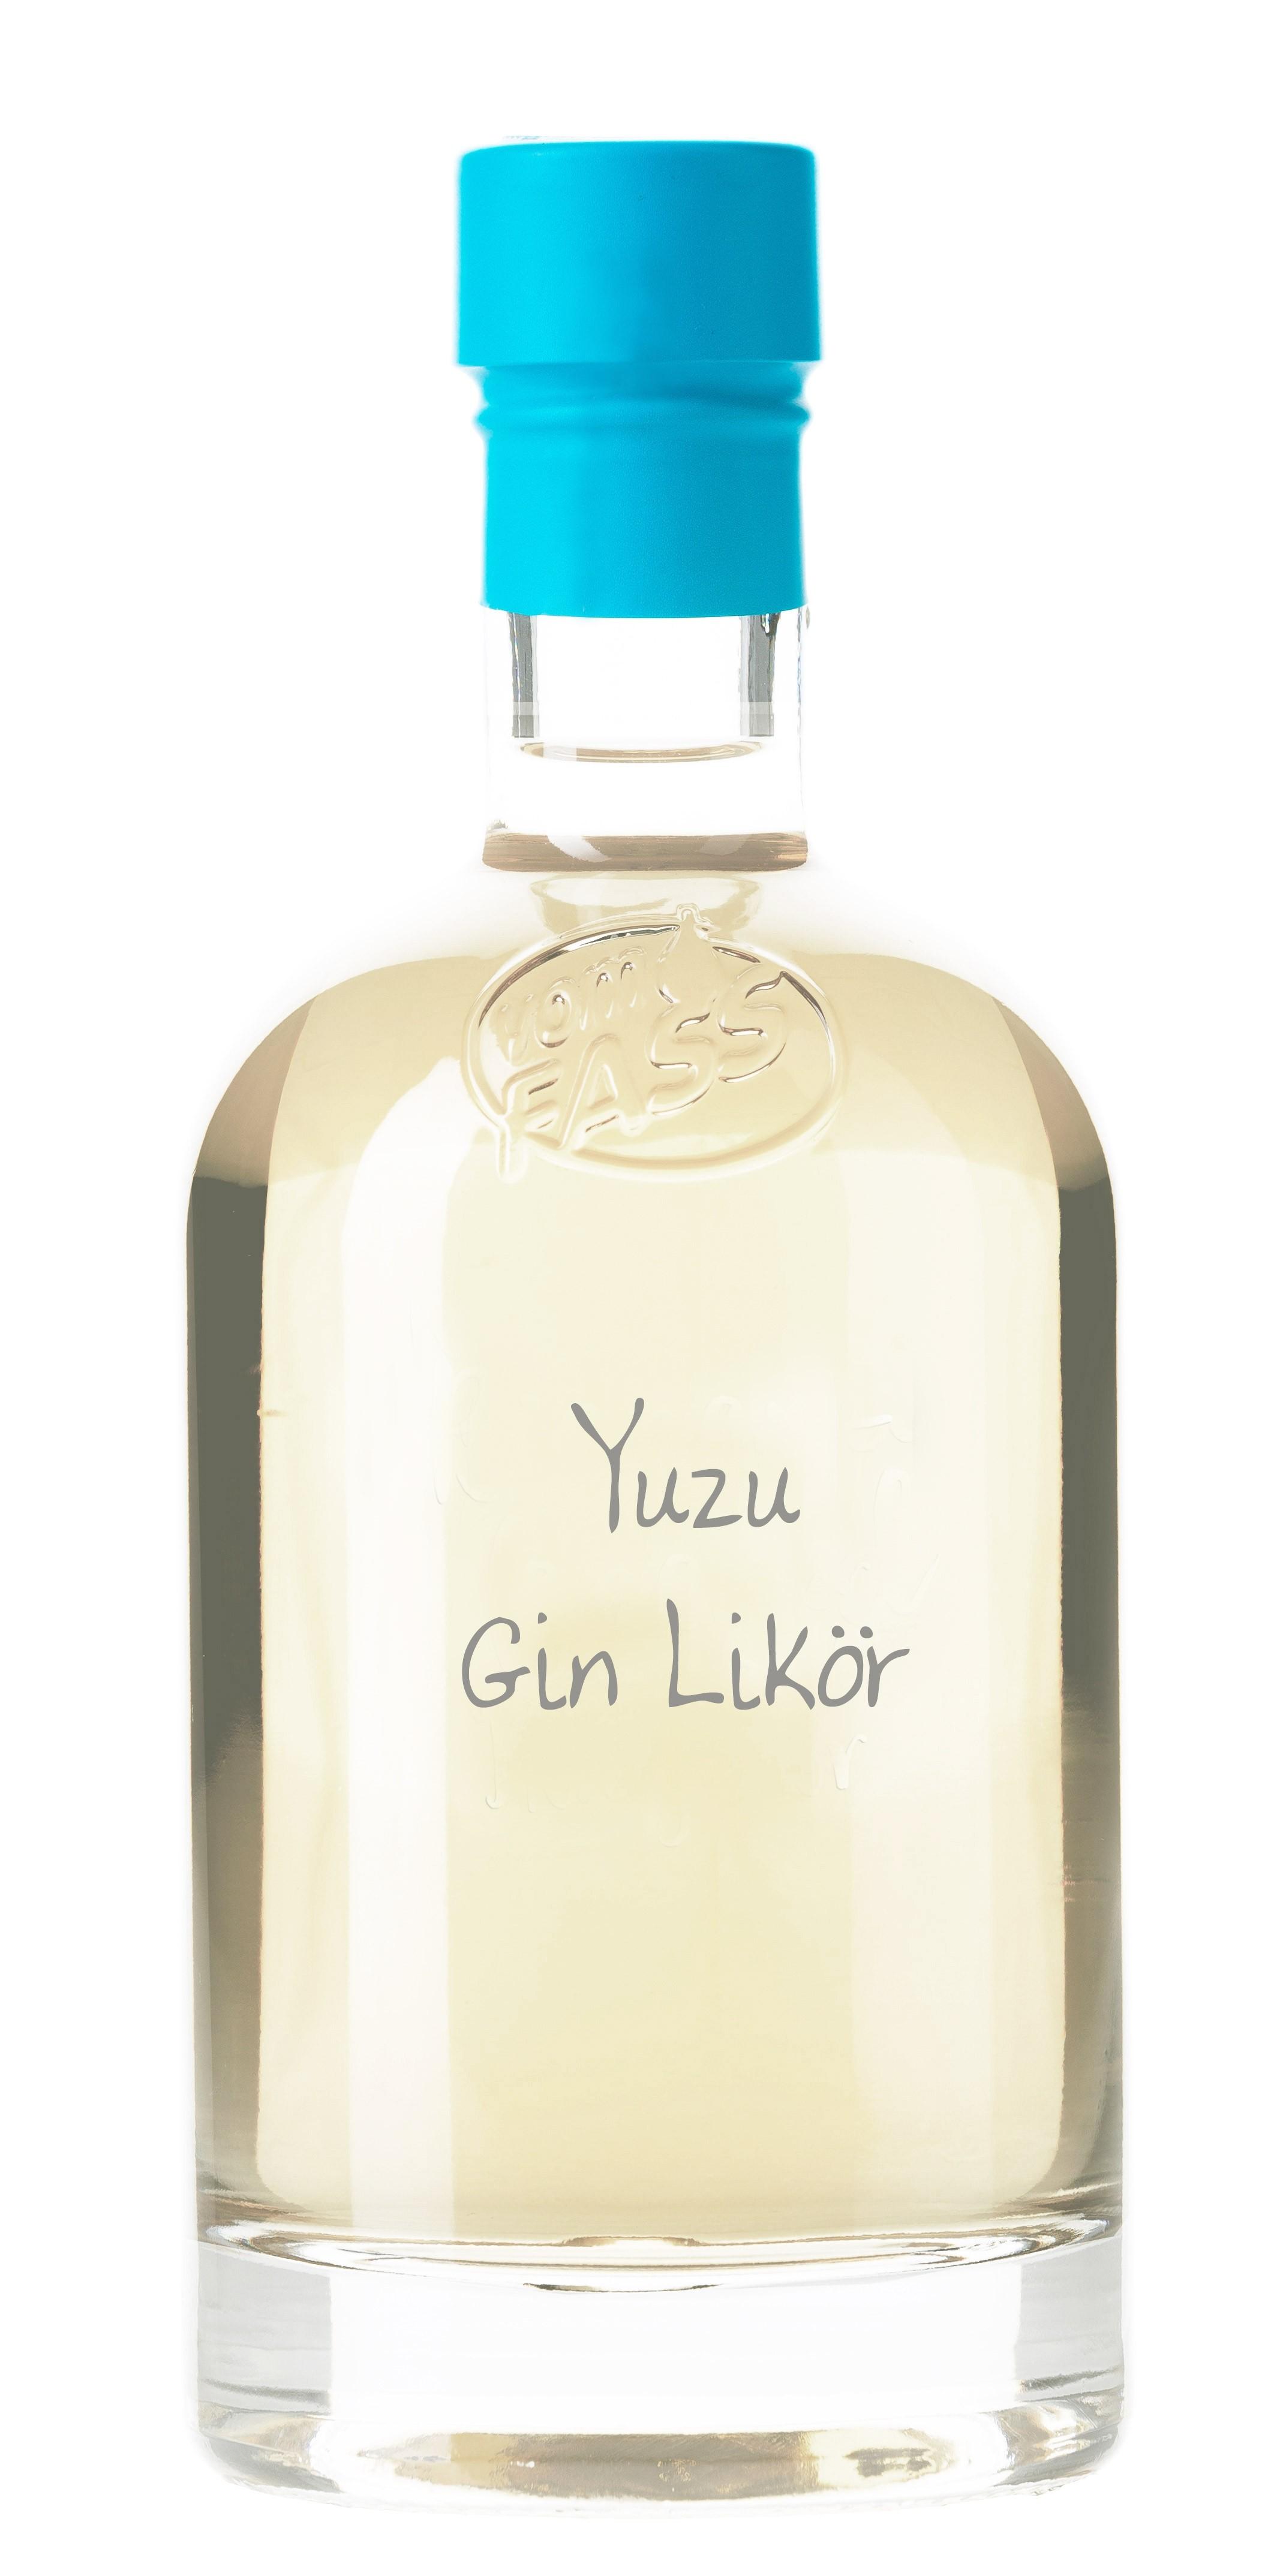 Ichiban Yuzu Gin-Likör